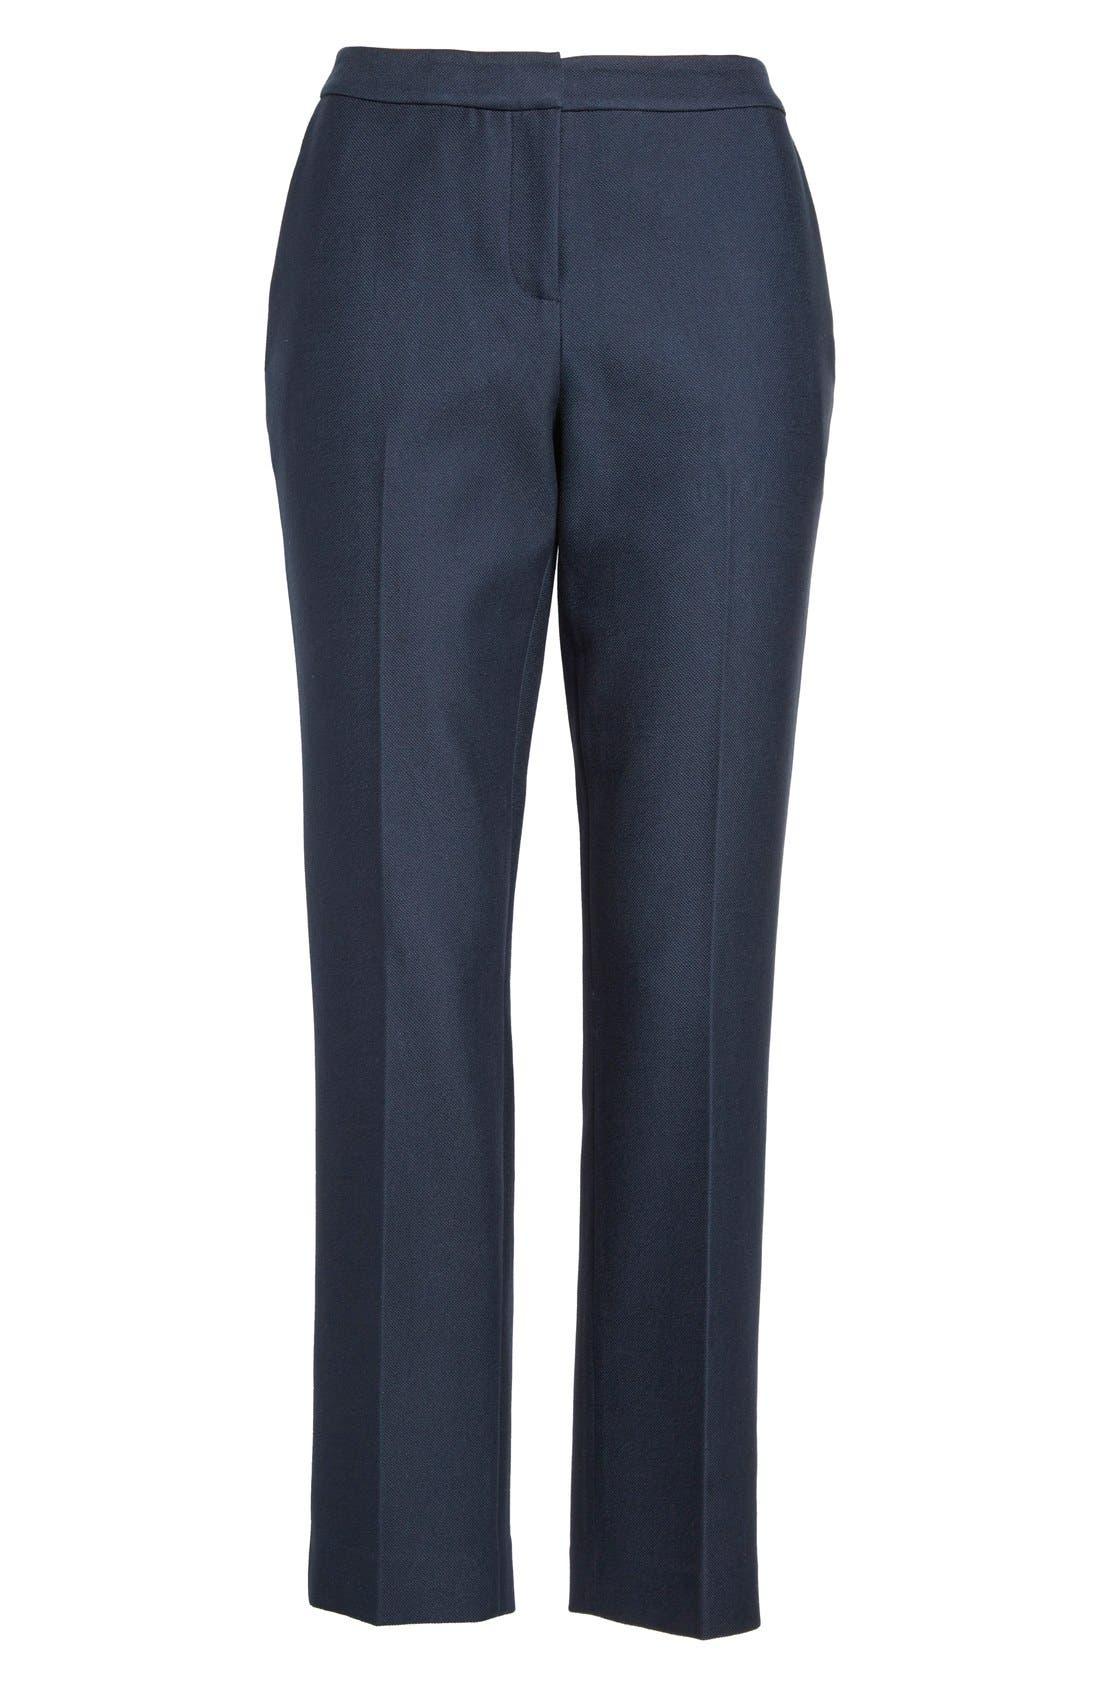 Alternate Image 4  - Nordstrom Signature and Caroline Issa 'Raindrop' Slim Cotton Ankle Pants